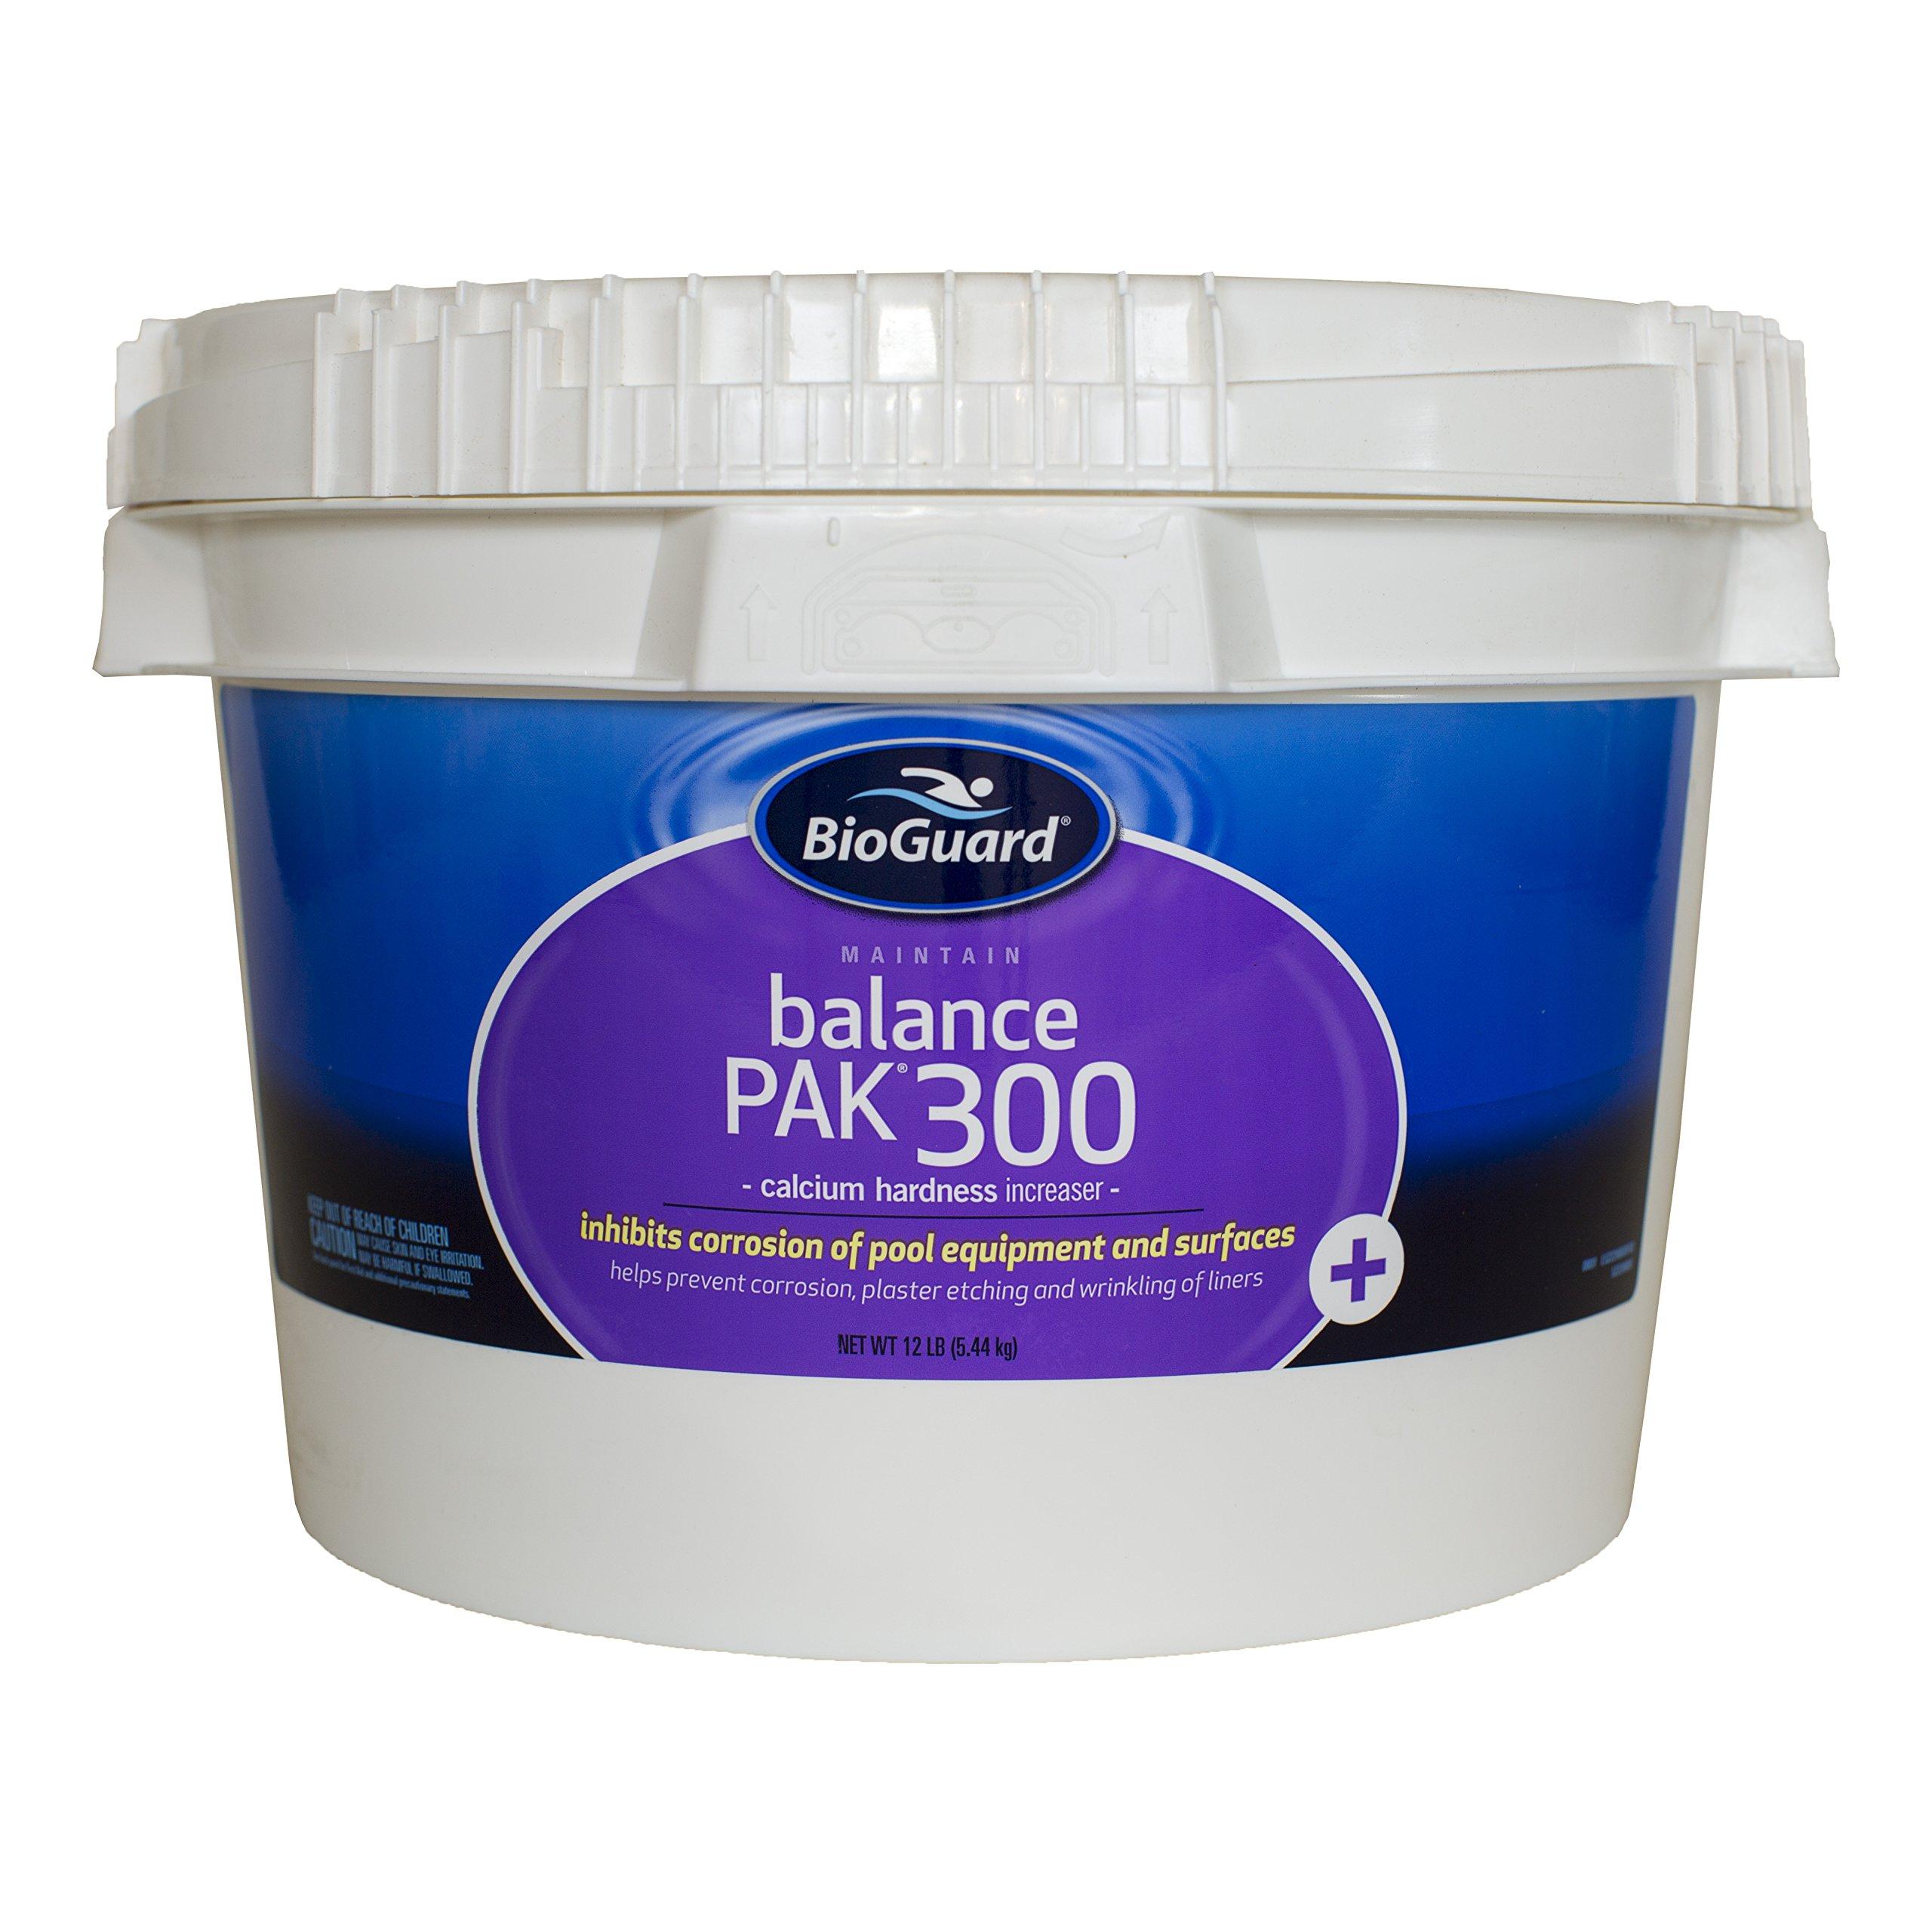 BioGuard Balance Pak 300 - 12 Lb 52220BIO